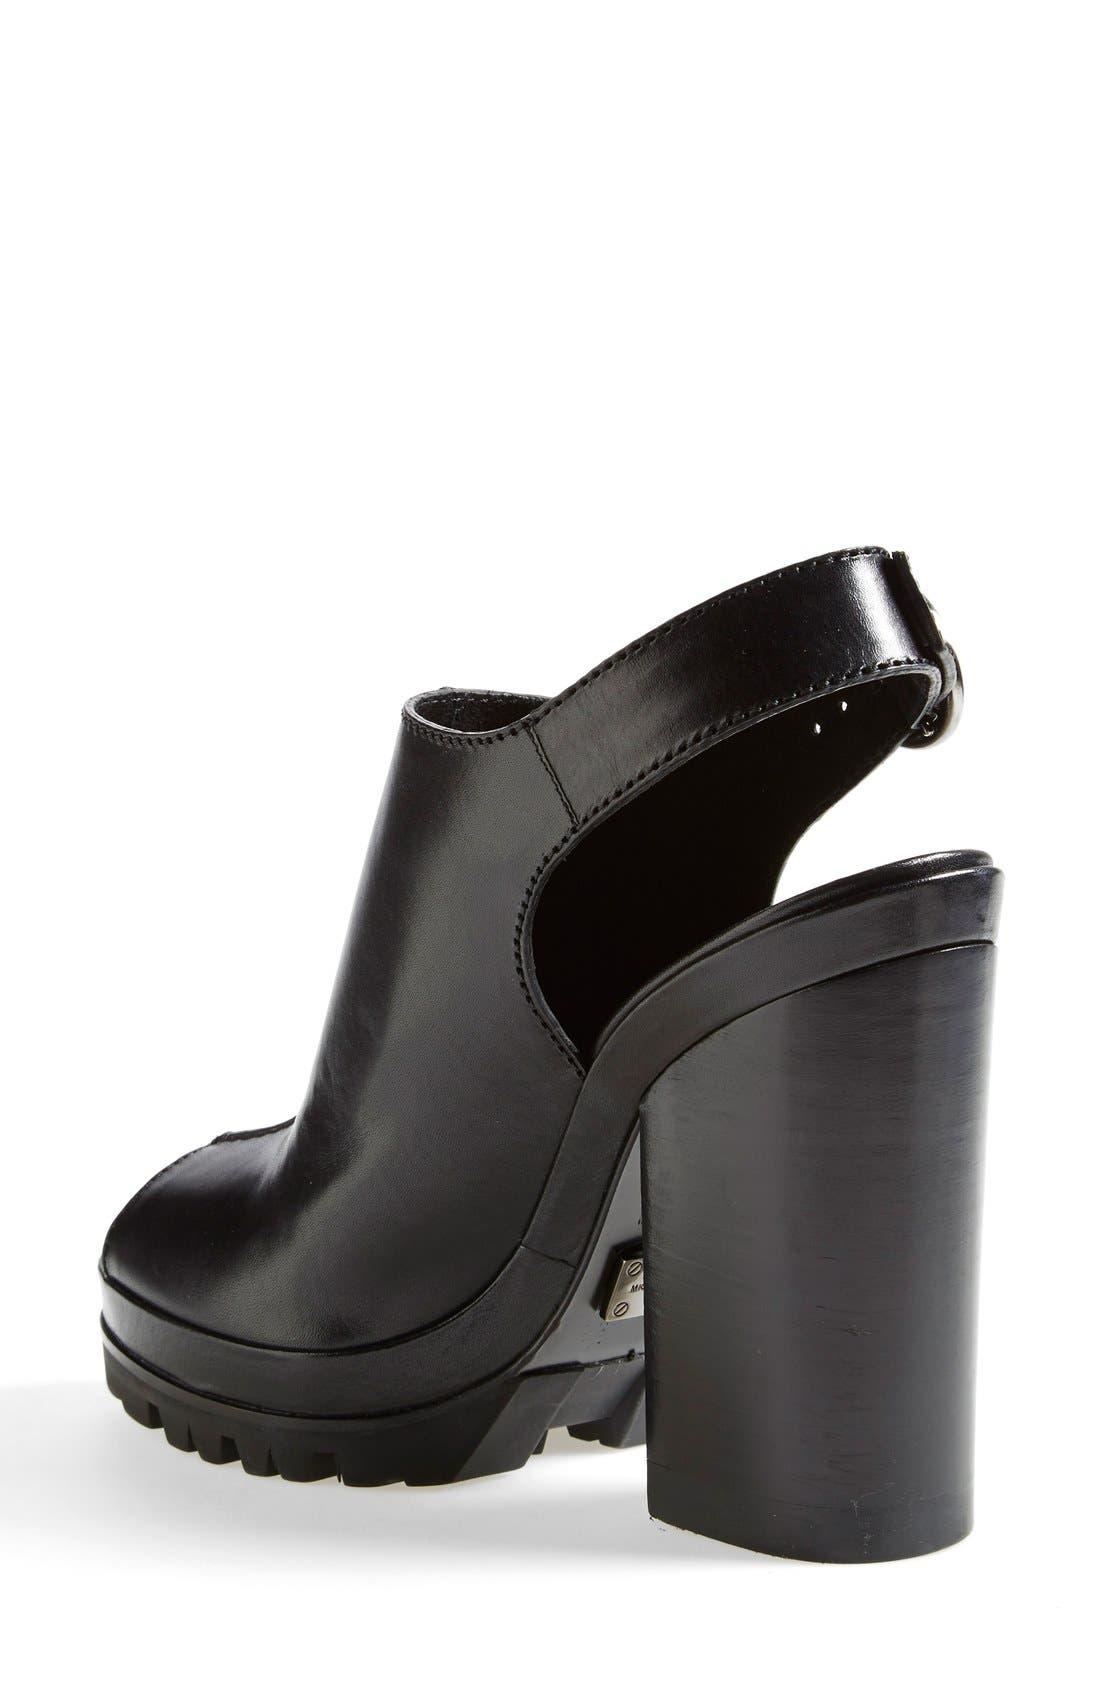 Alternate Image 2  - Michael Kors 'Patras' Sandal (Women)